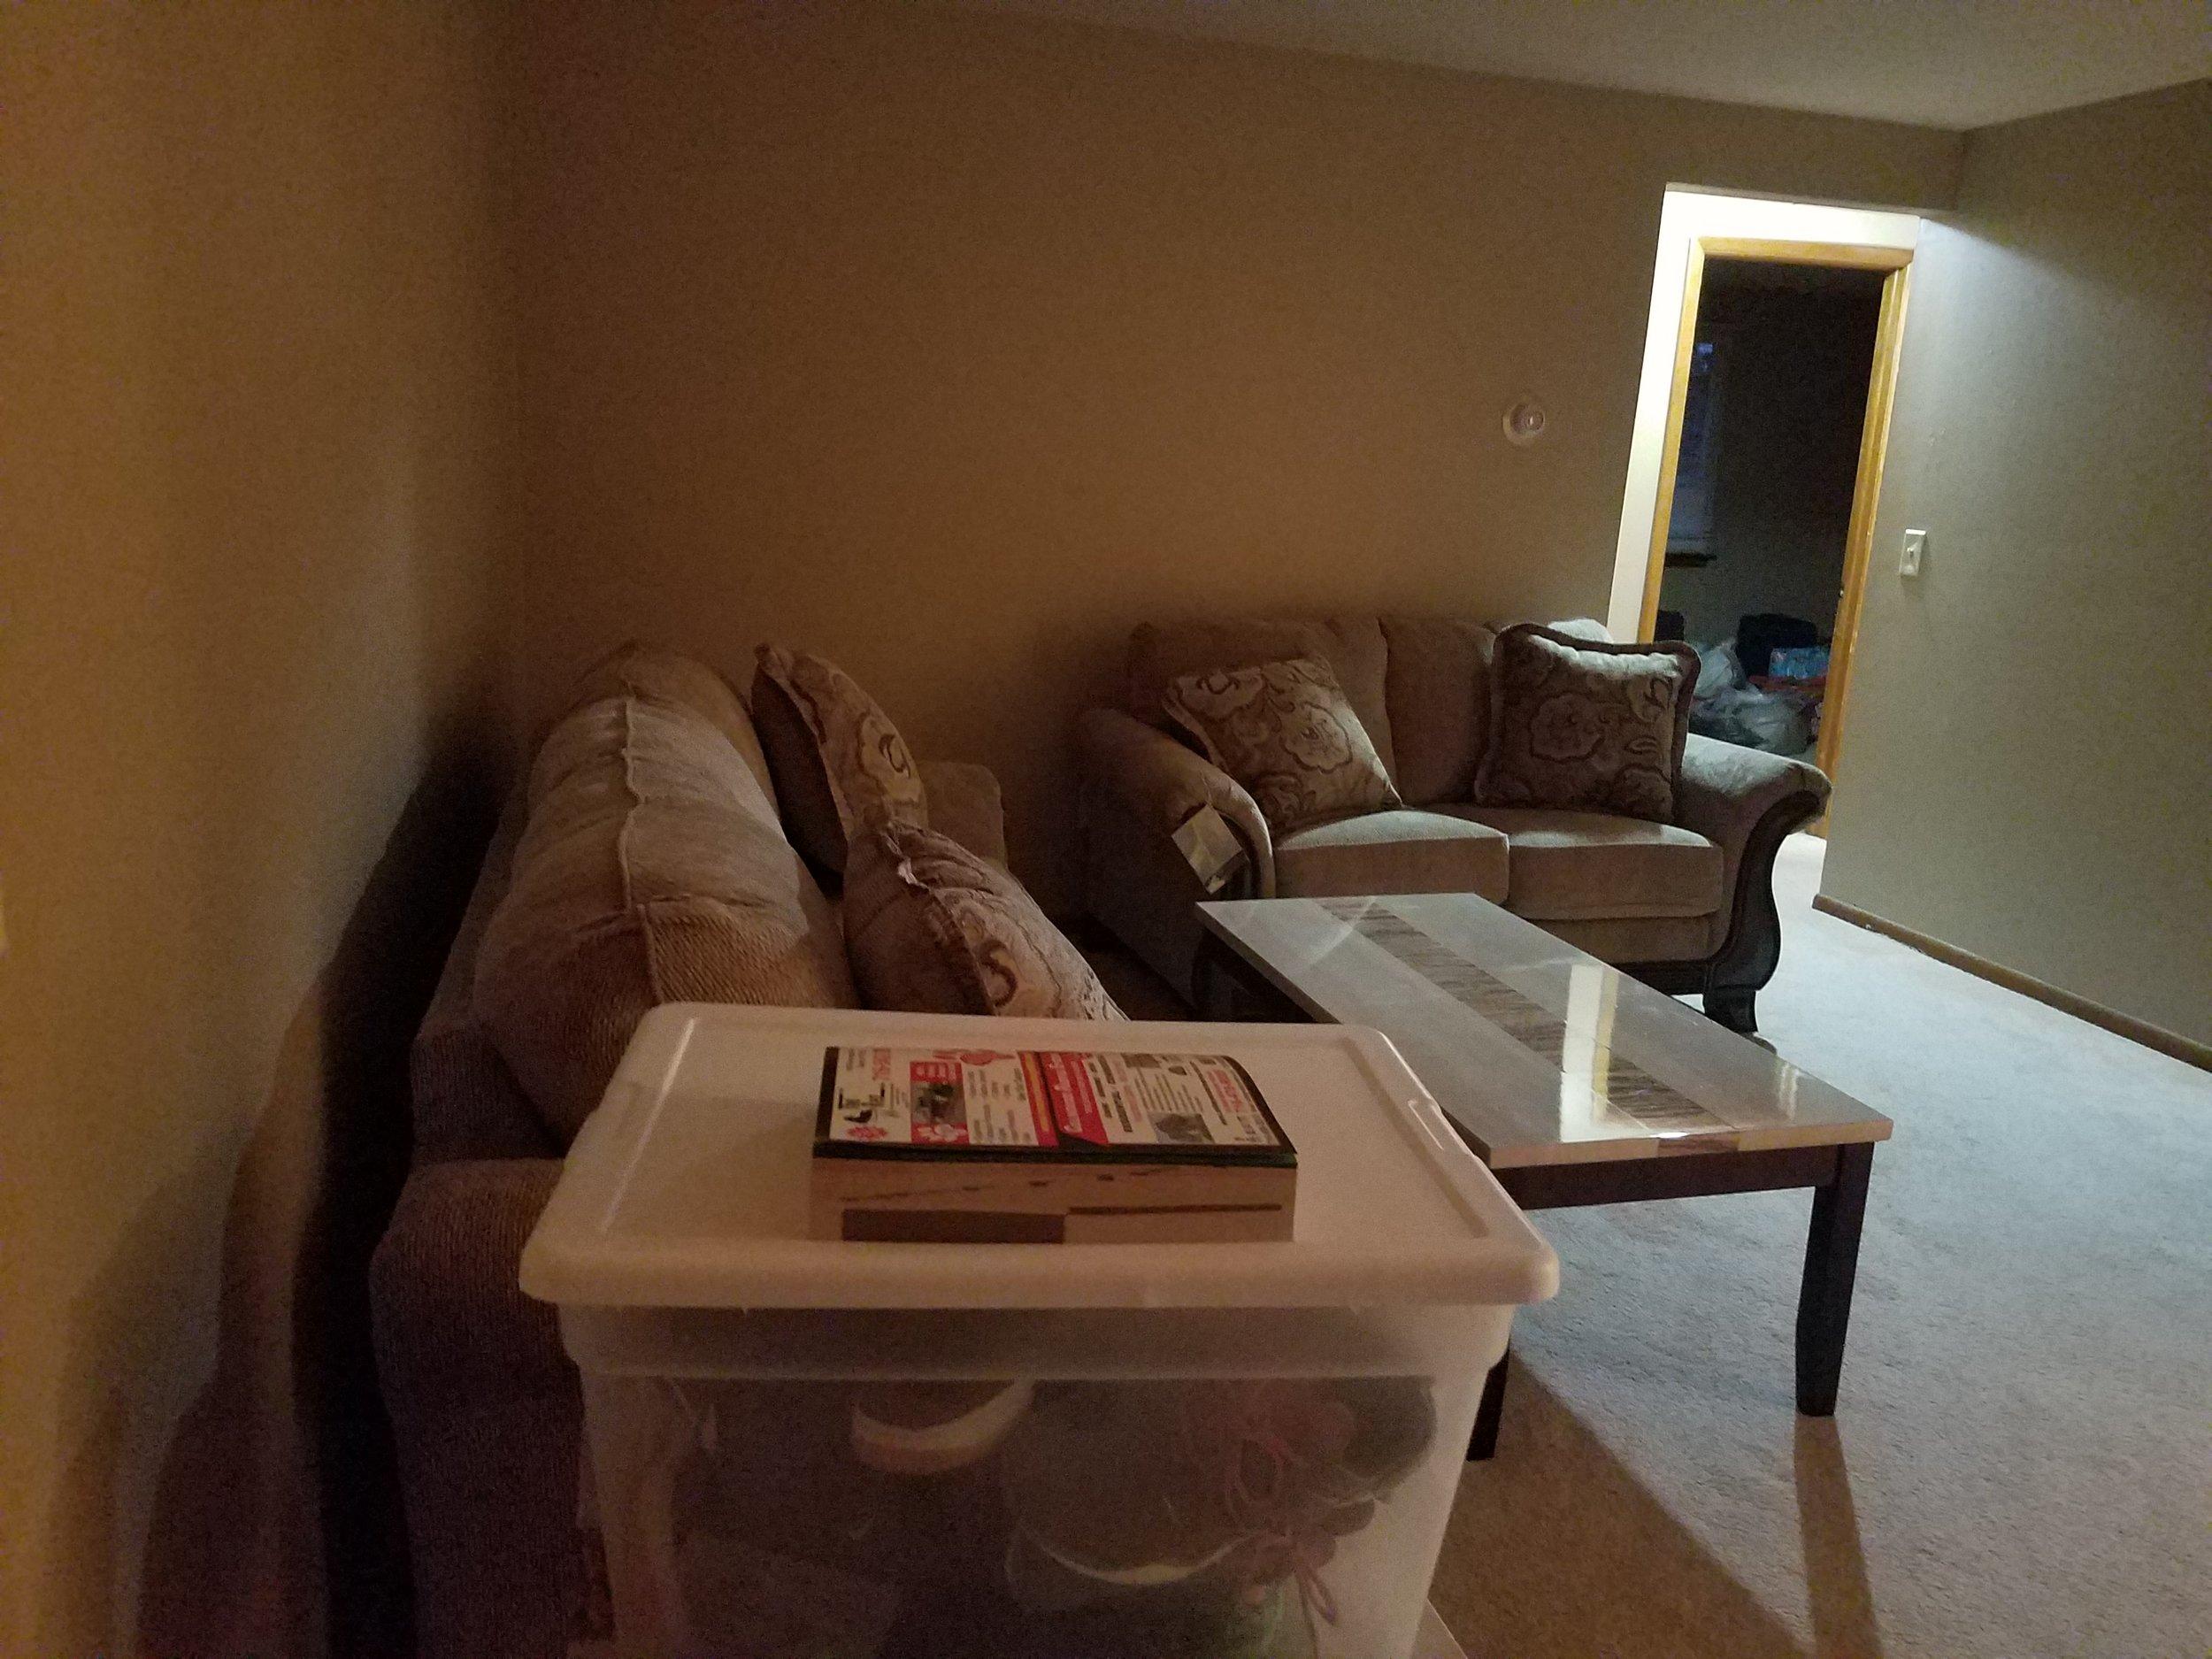 Livingroom before 1.jpg